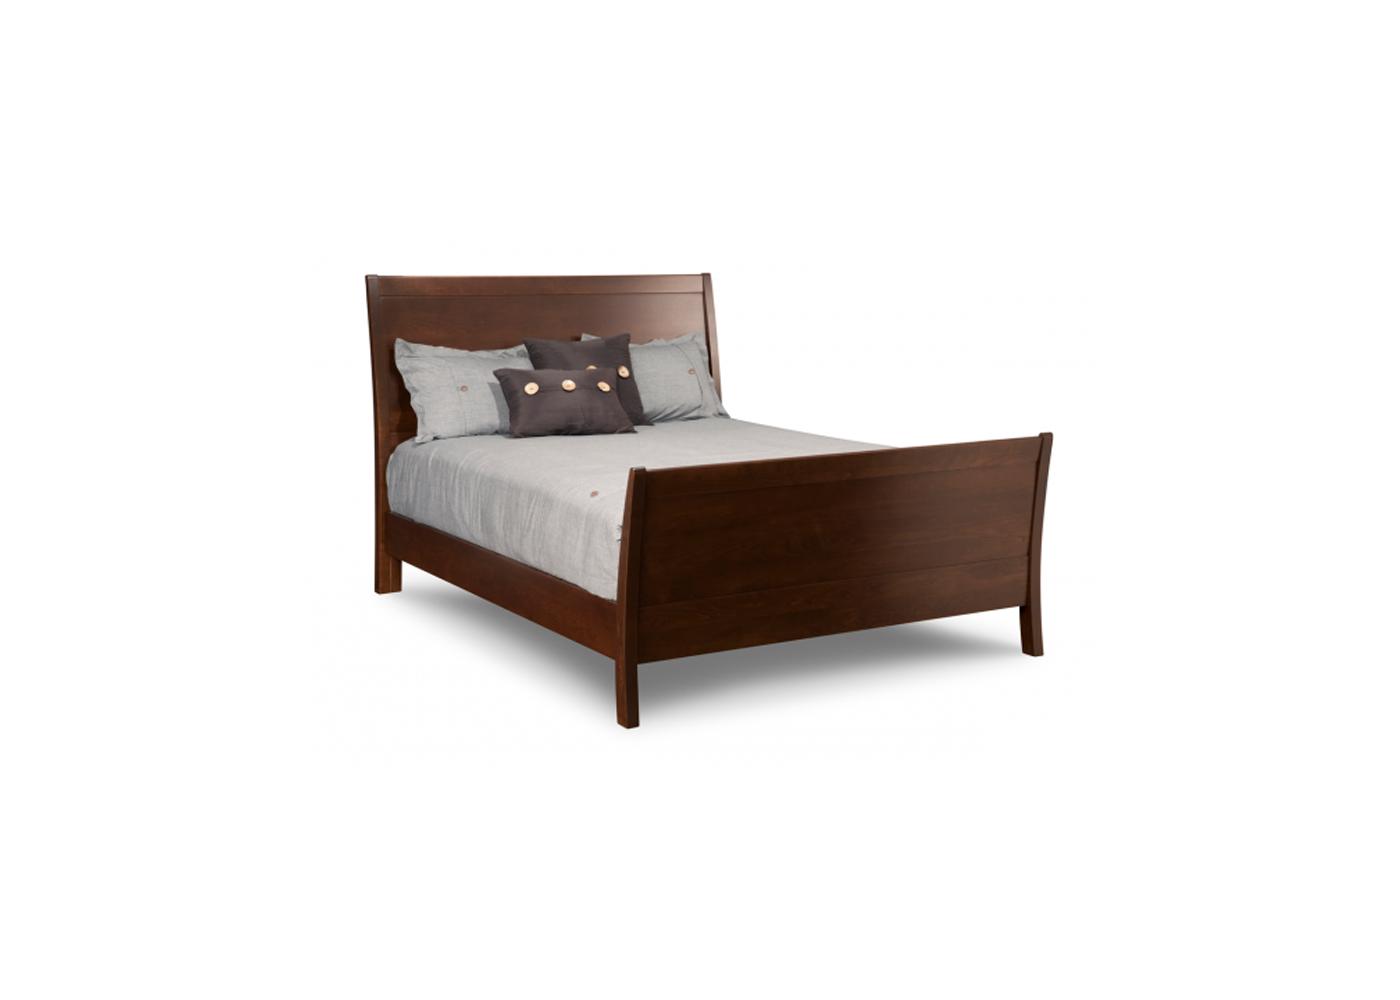 Polanco Furniture Store Ottawa Interior Decor Solutions Beds